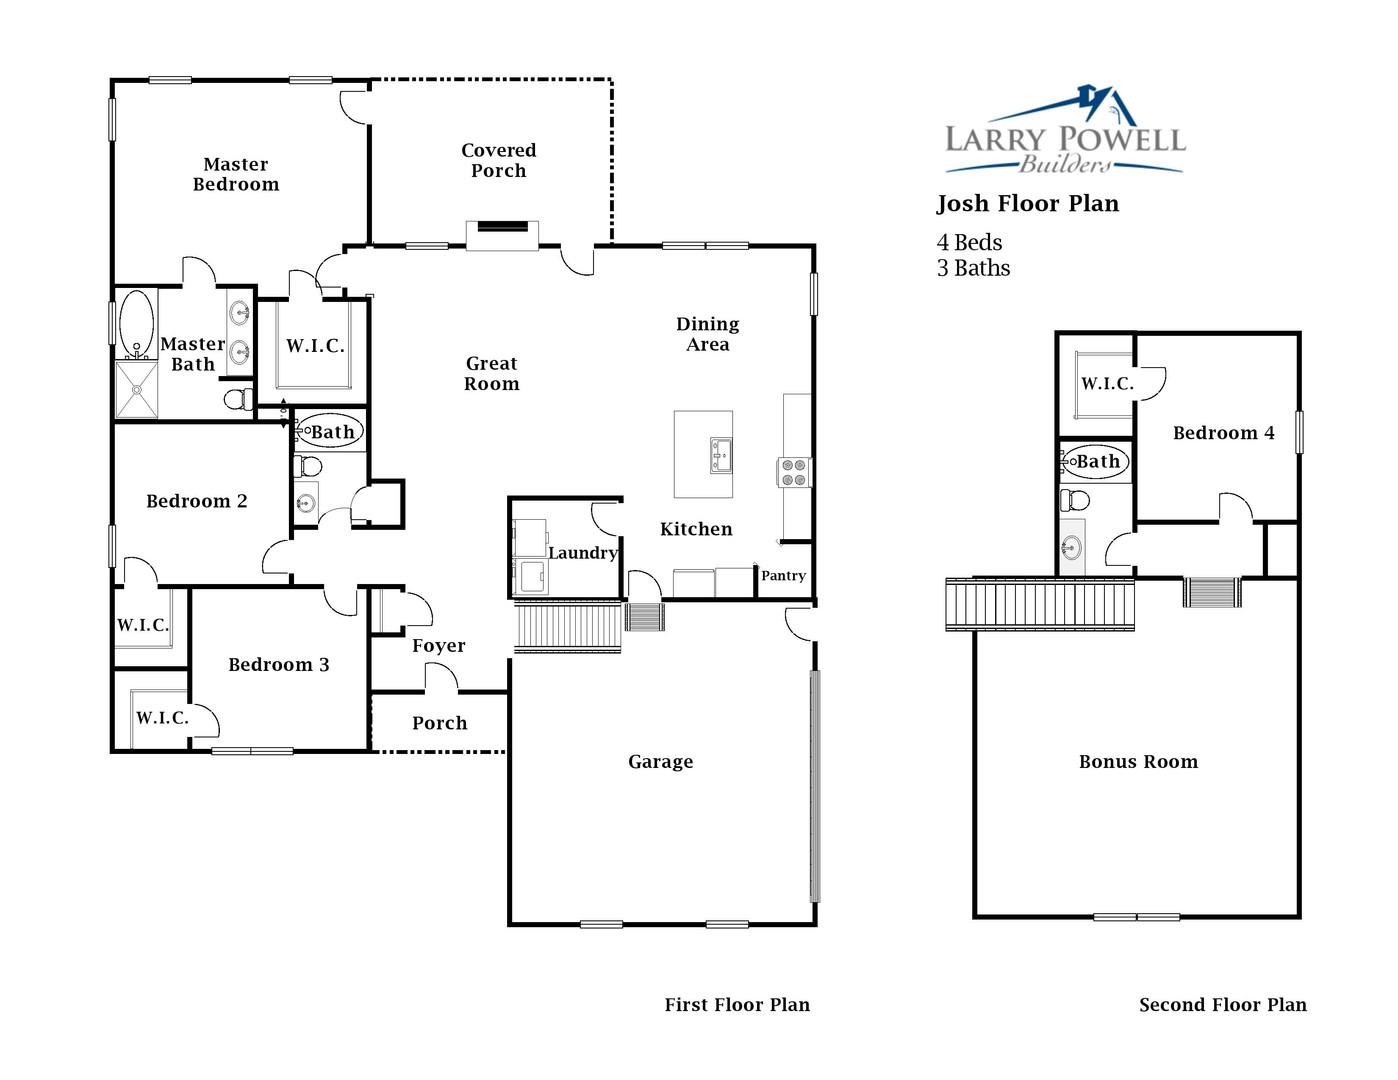 The Josh Floor Plan